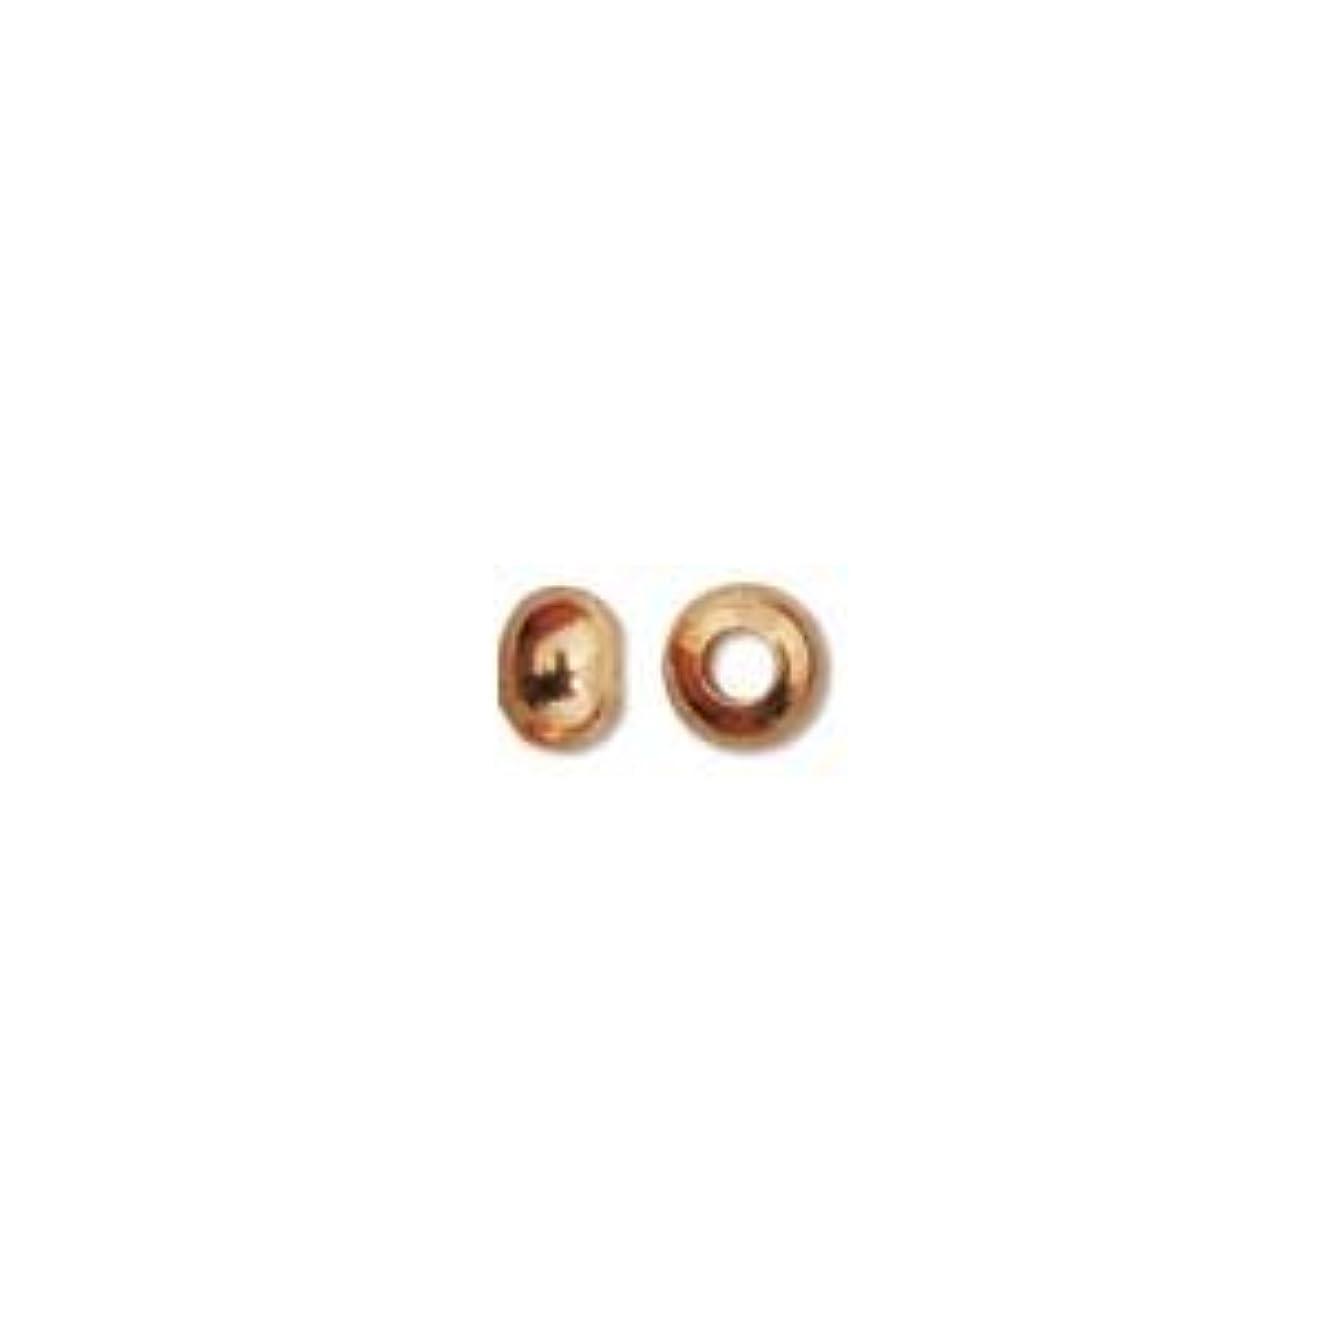 3mm Copper Donut Bead (100) 35128